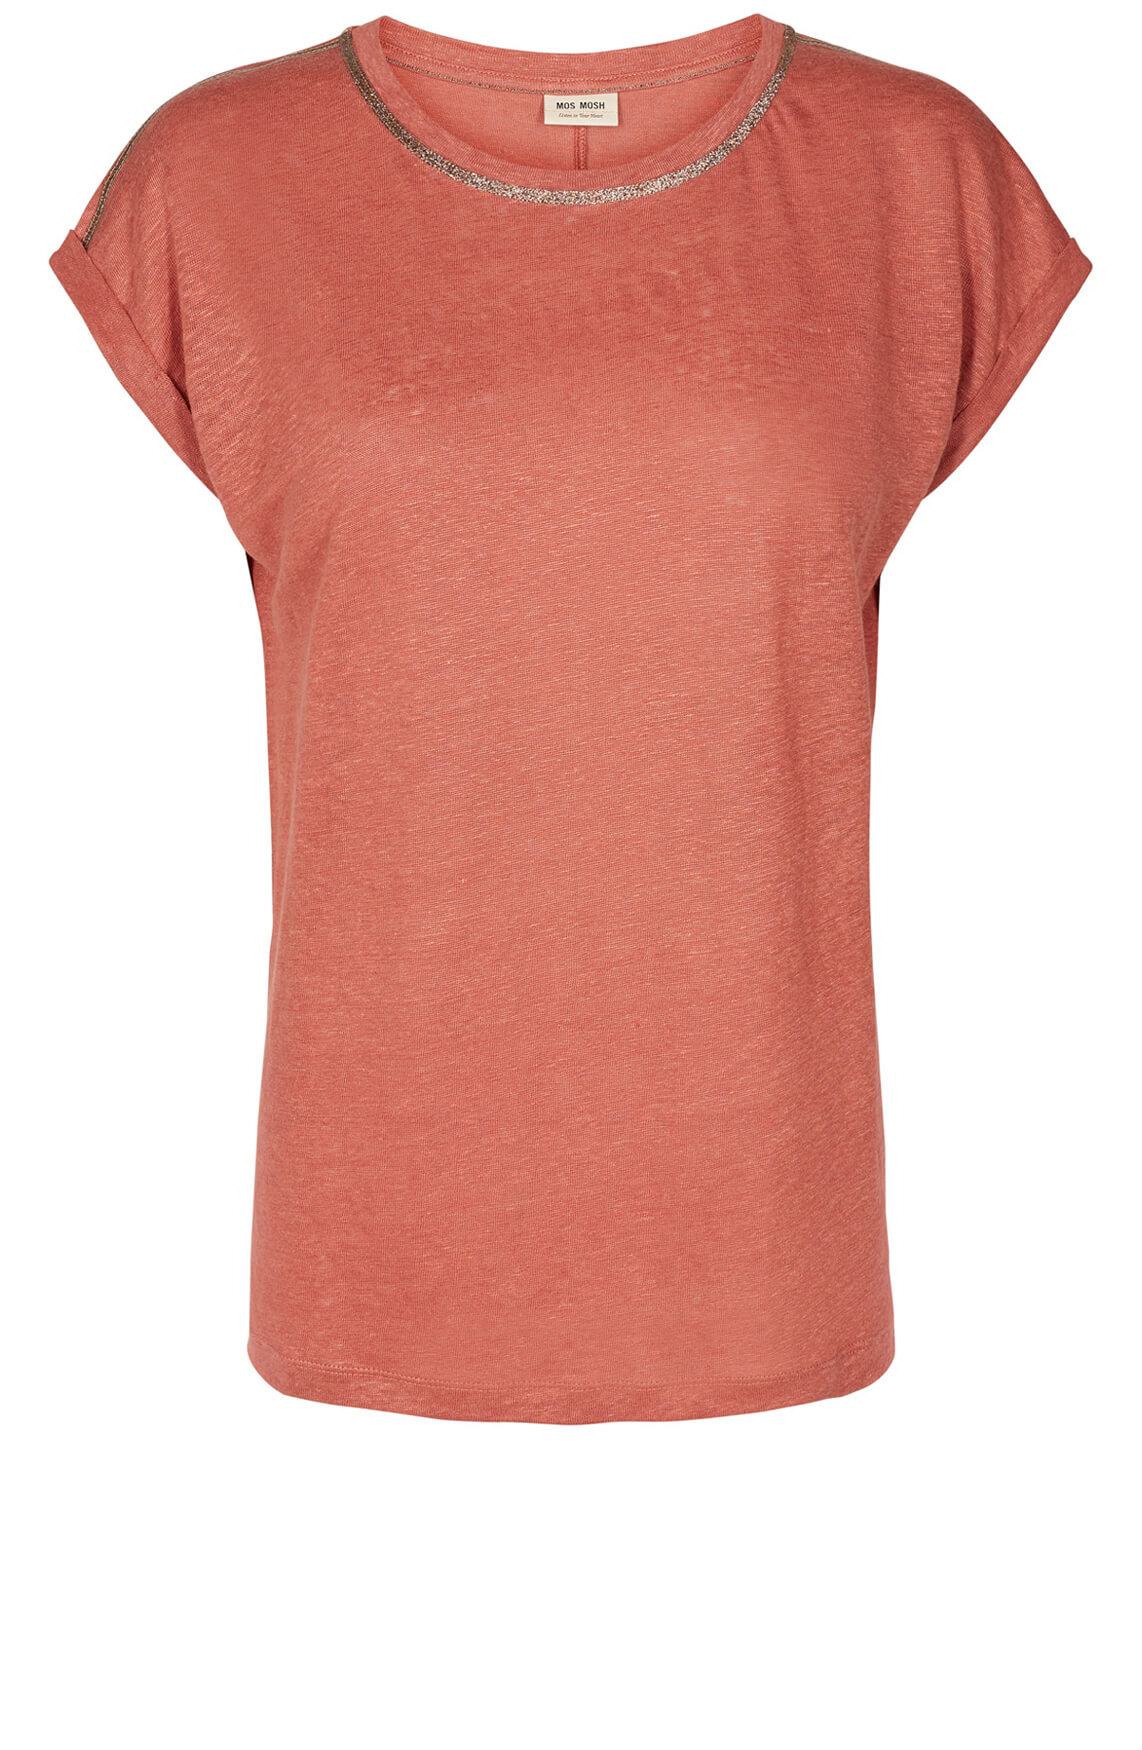 Mos Mosh Dames Ina linnen shirt Rood